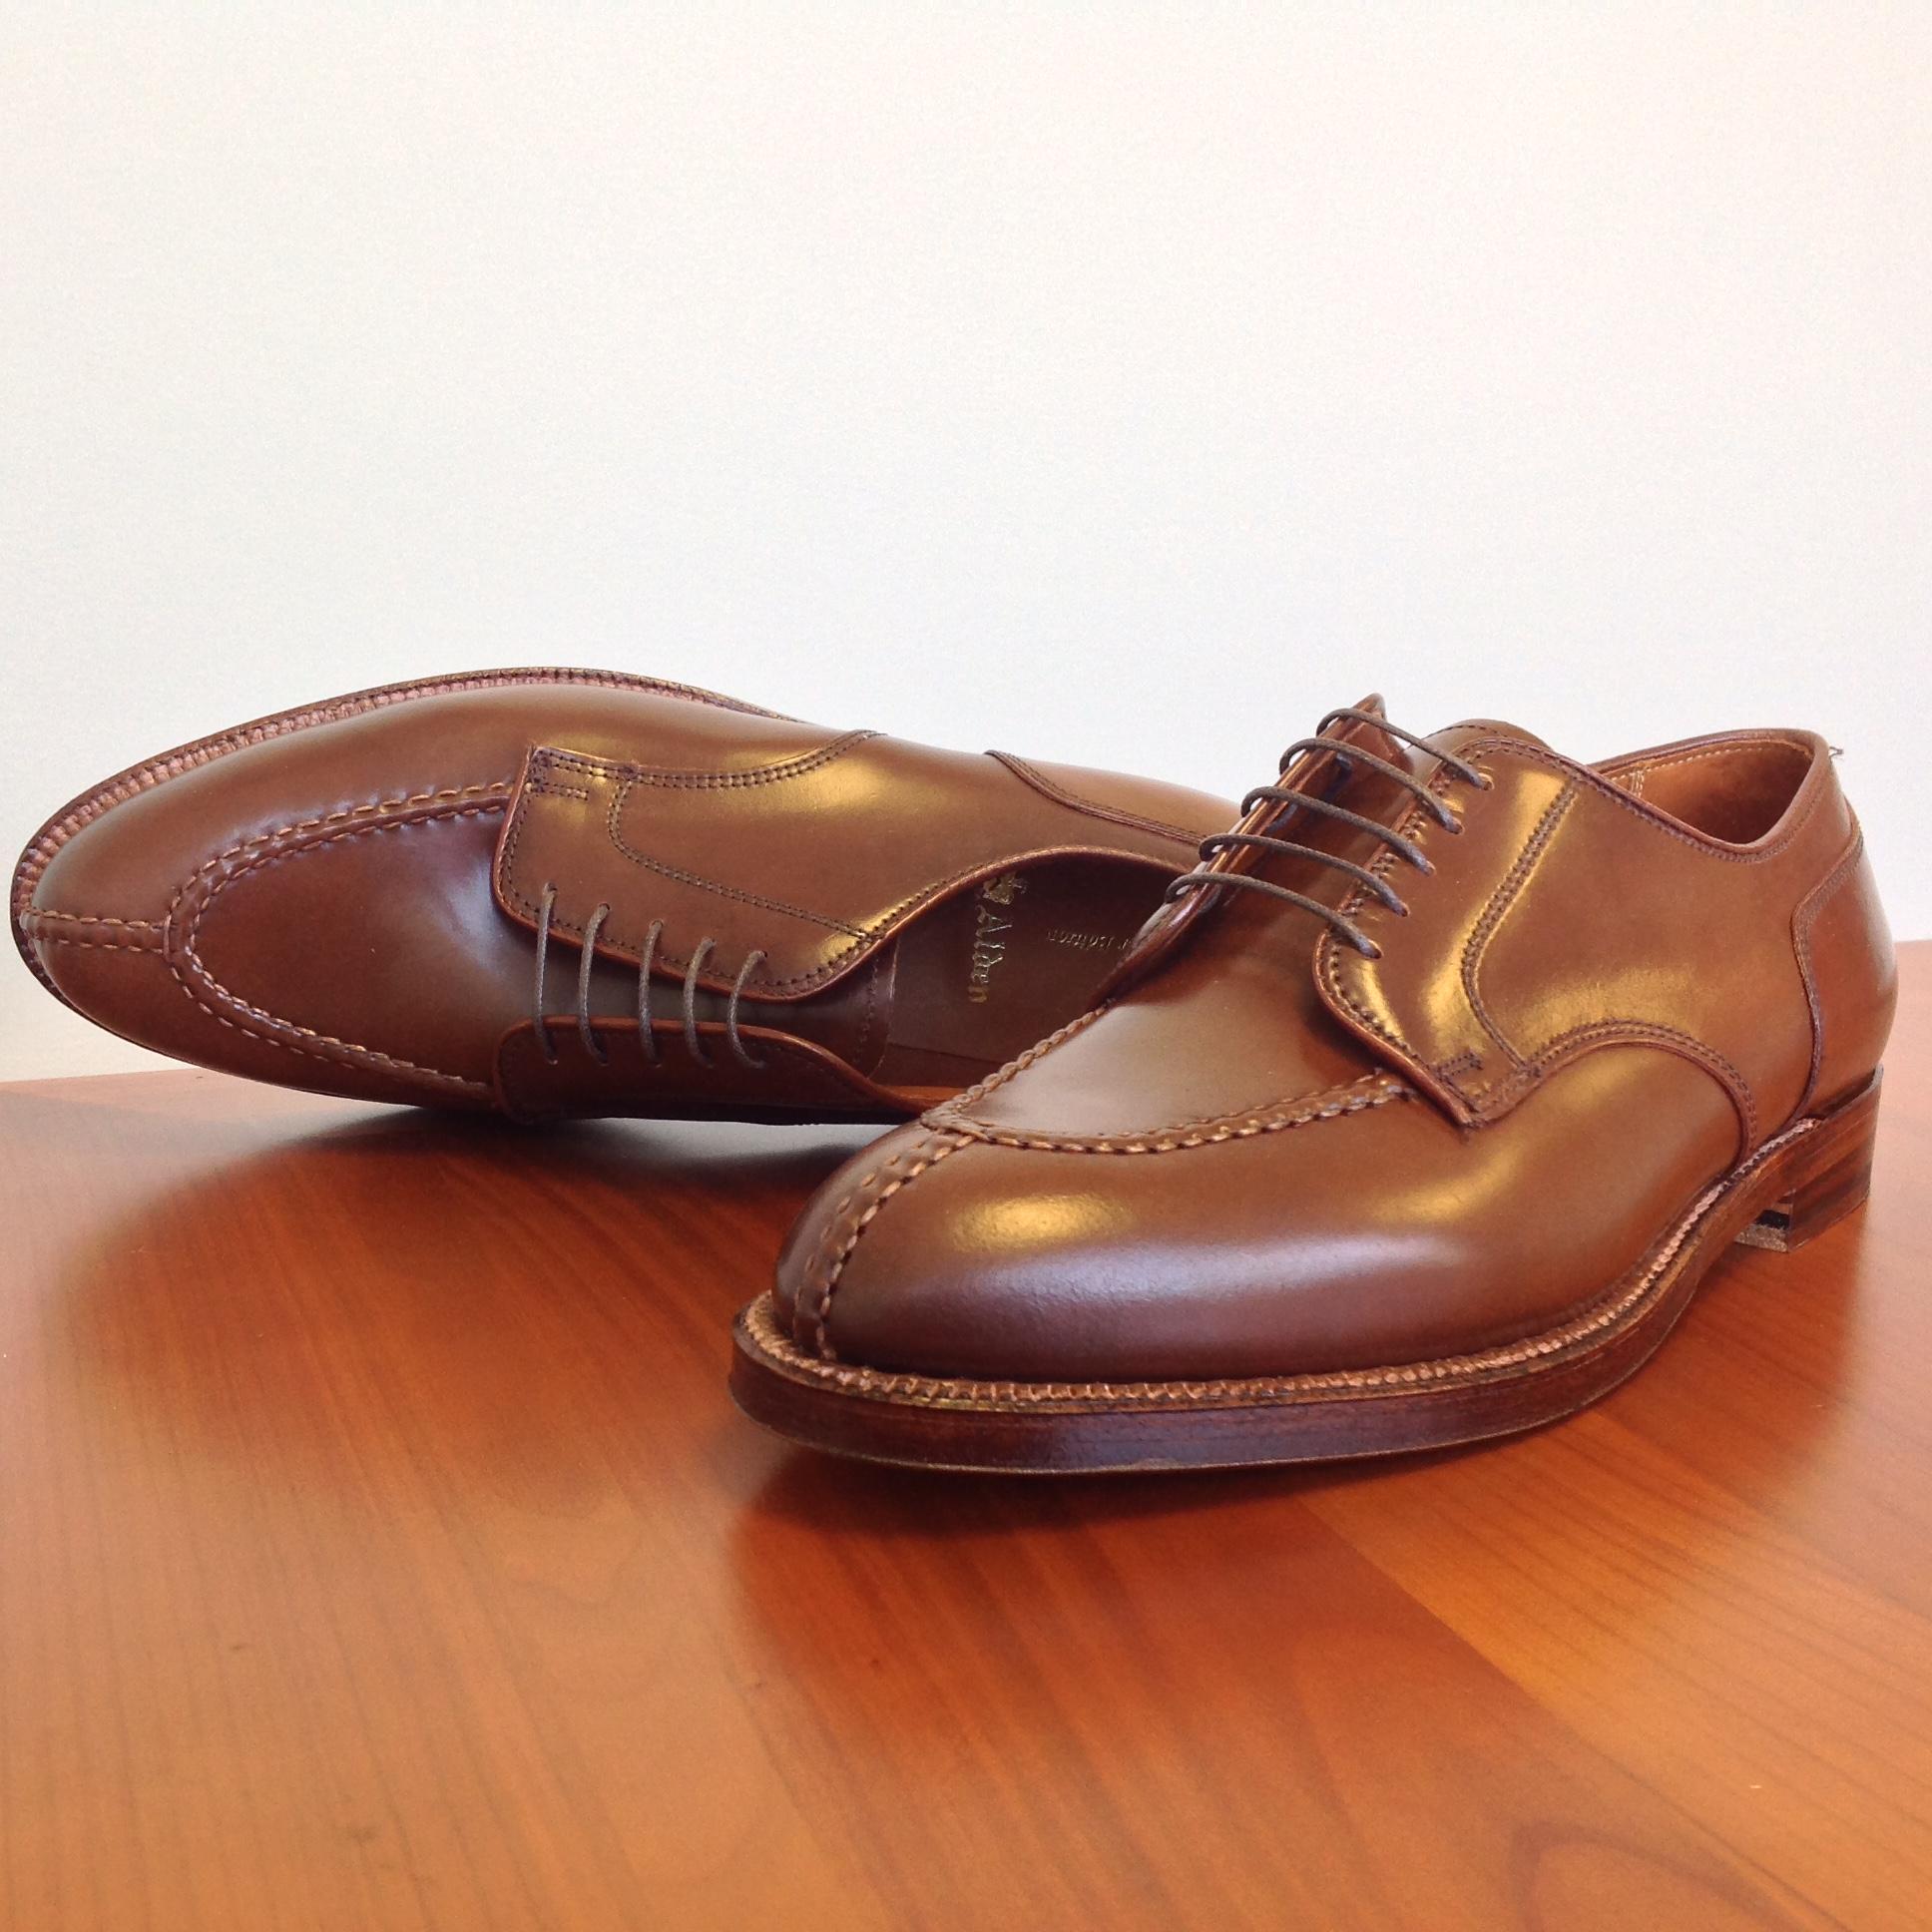 Alden Ravello Shell Cordovan Shoes